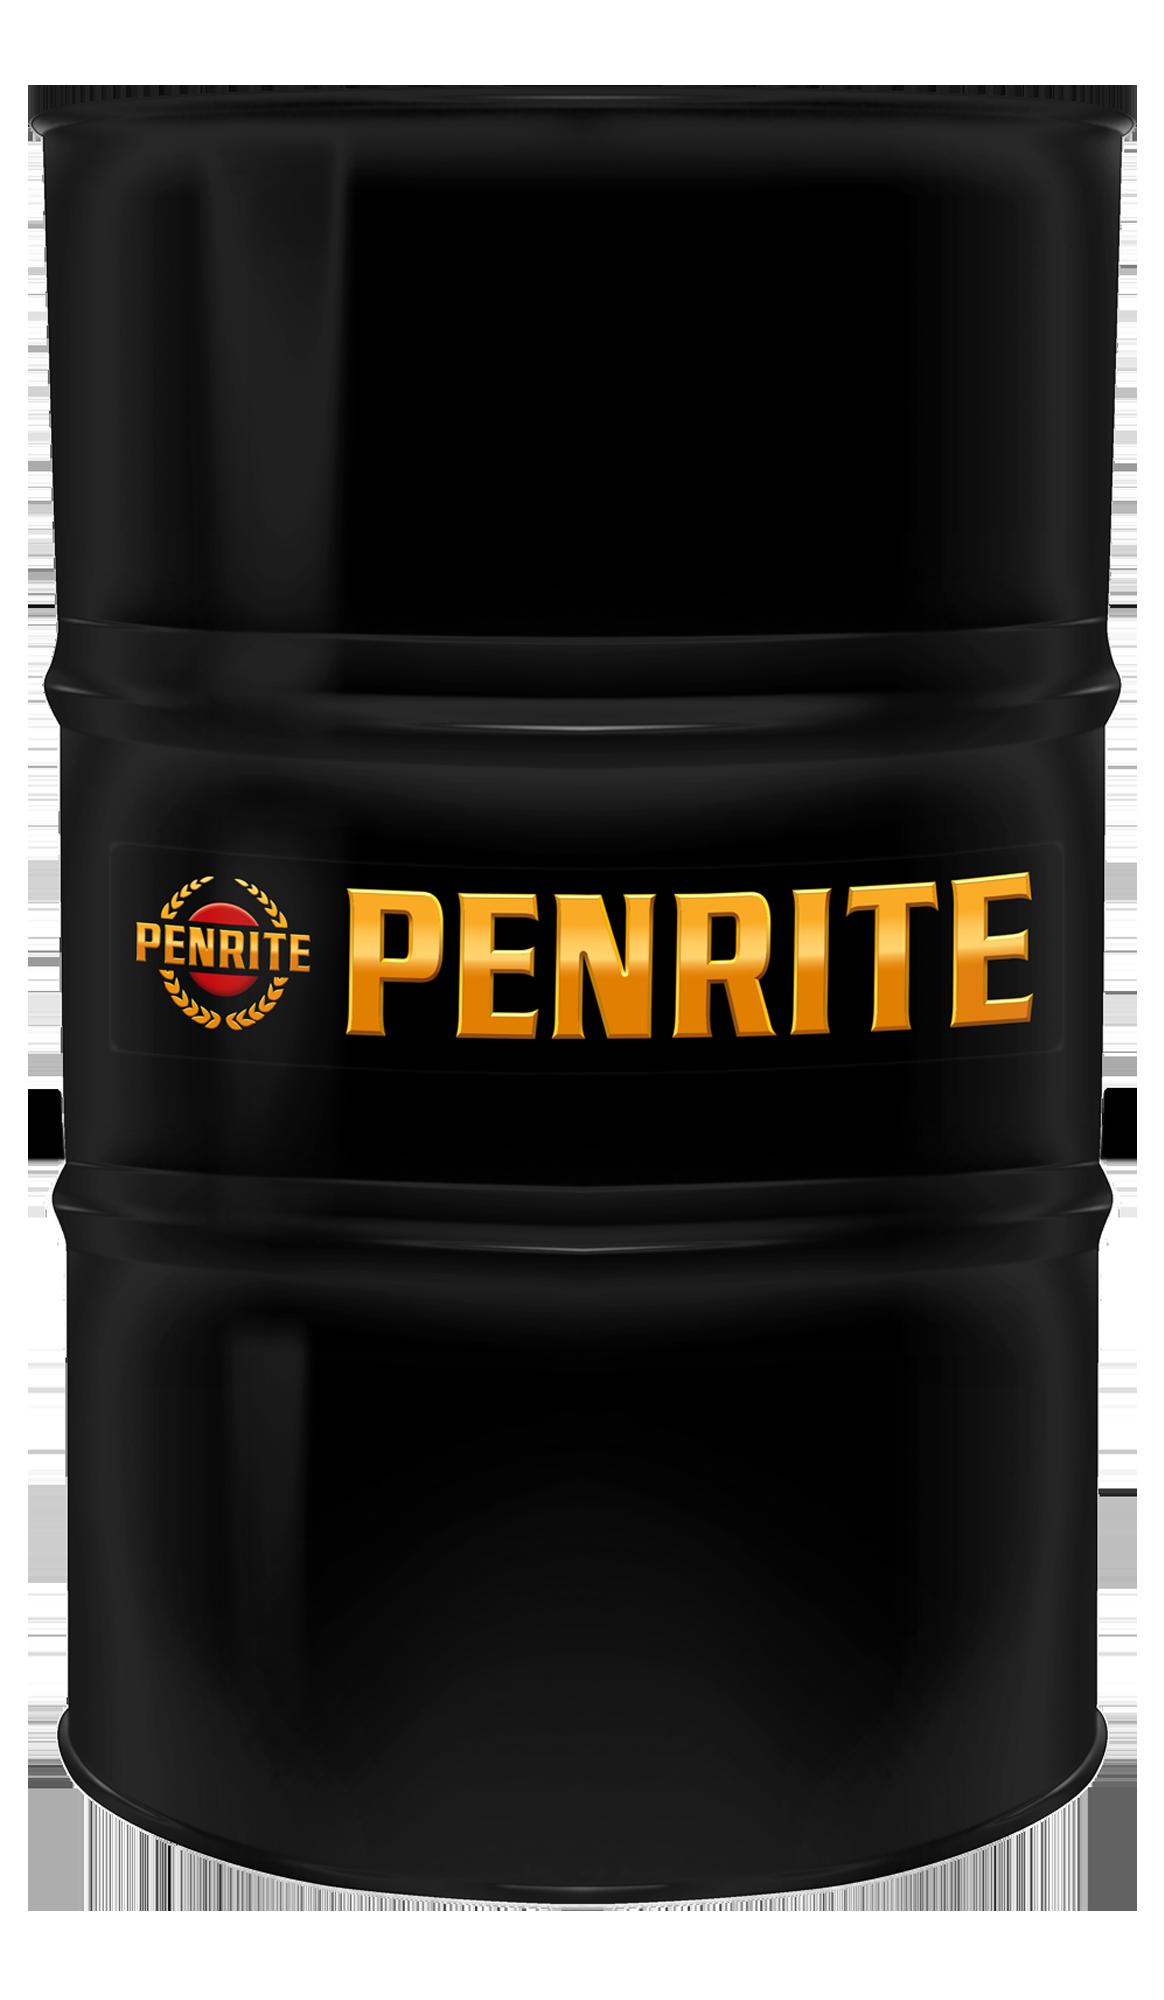 Penrite Oil - FINAL DRIVE (FD01) FLUID (CAT) SAE 60 - 205L